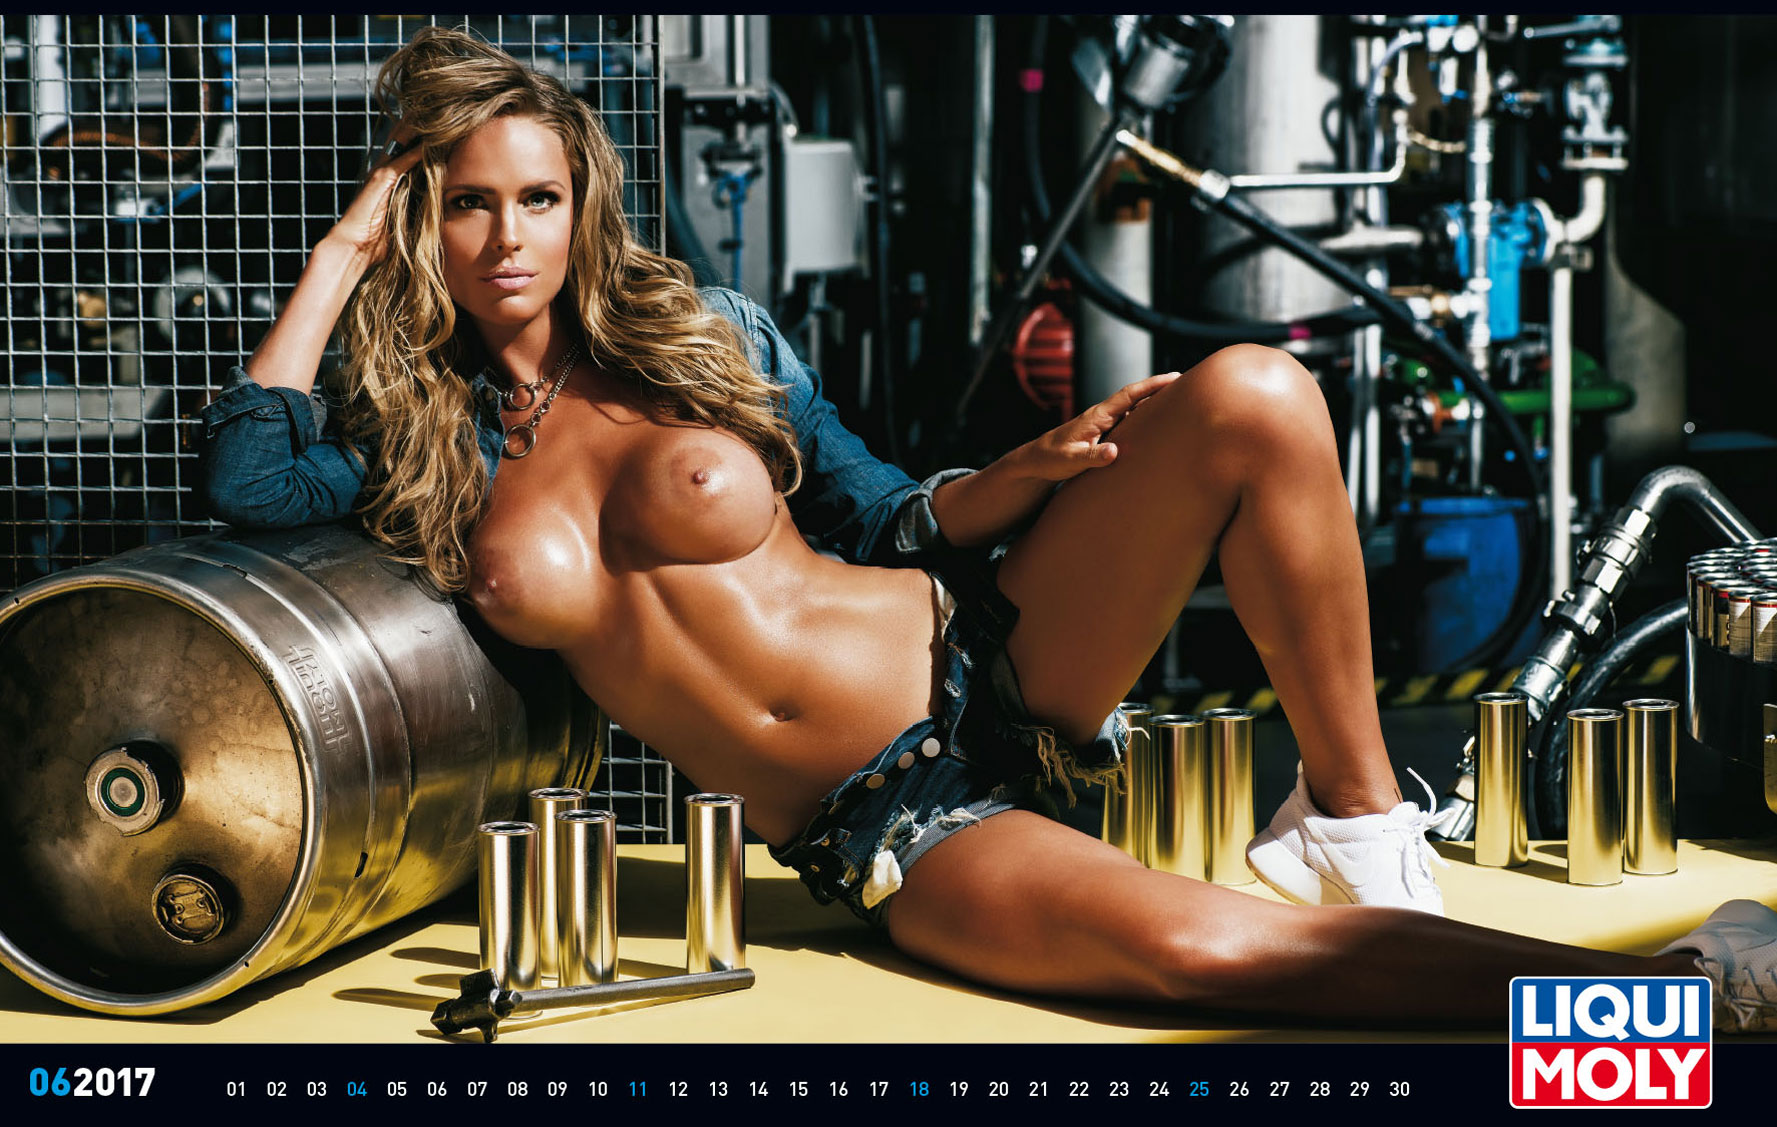 kalendar-eroticheskie-fotografii